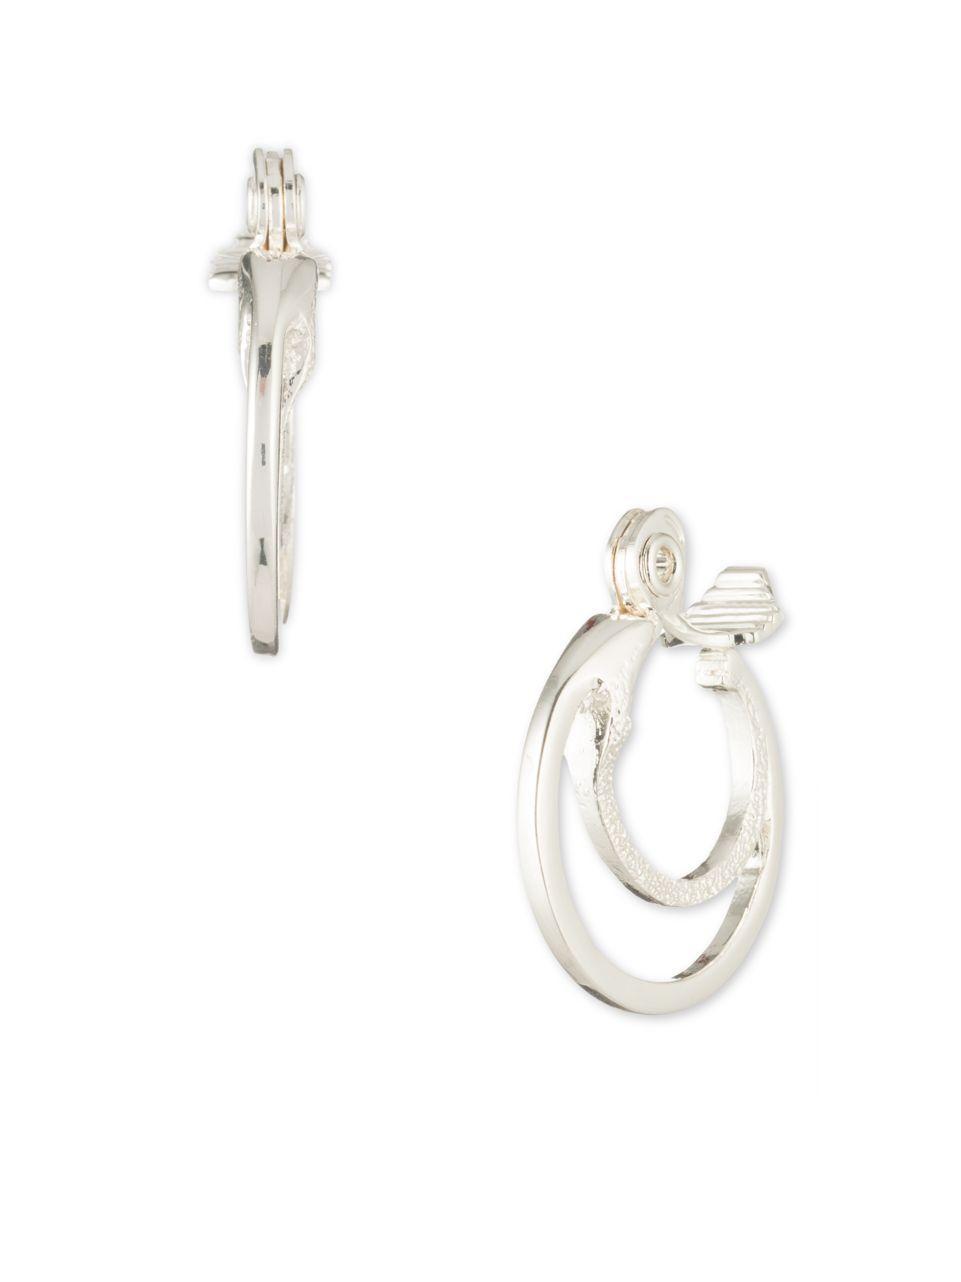 lyst anne klein textured double hoop earrings in metallic. Black Bedroom Furniture Sets. Home Design Ideas